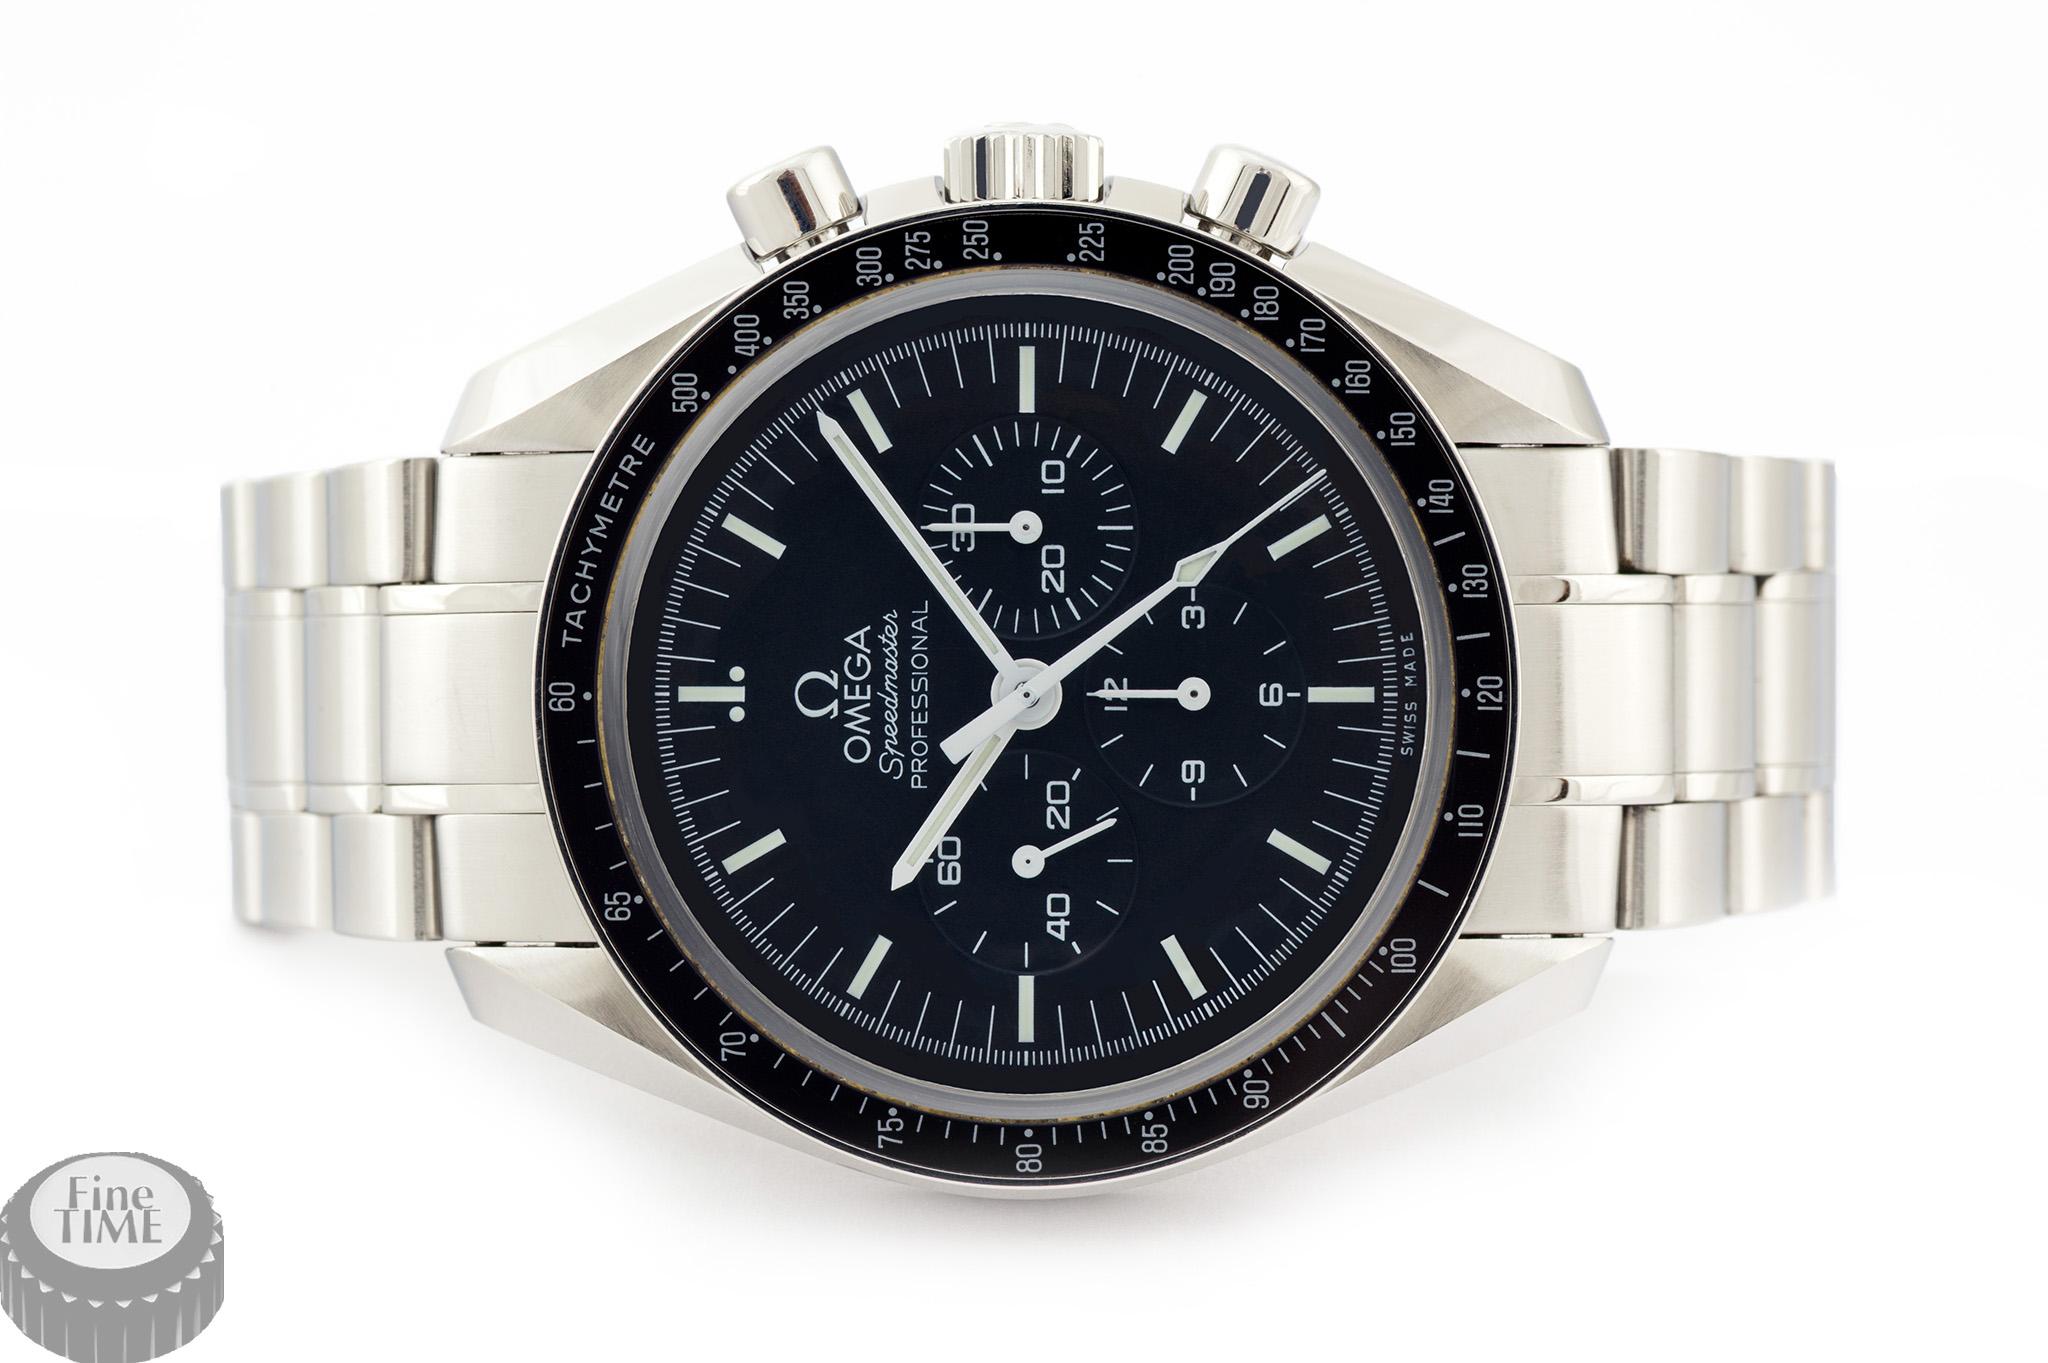 Omega Speedmaster Moonwatch Professional 3570.50.00